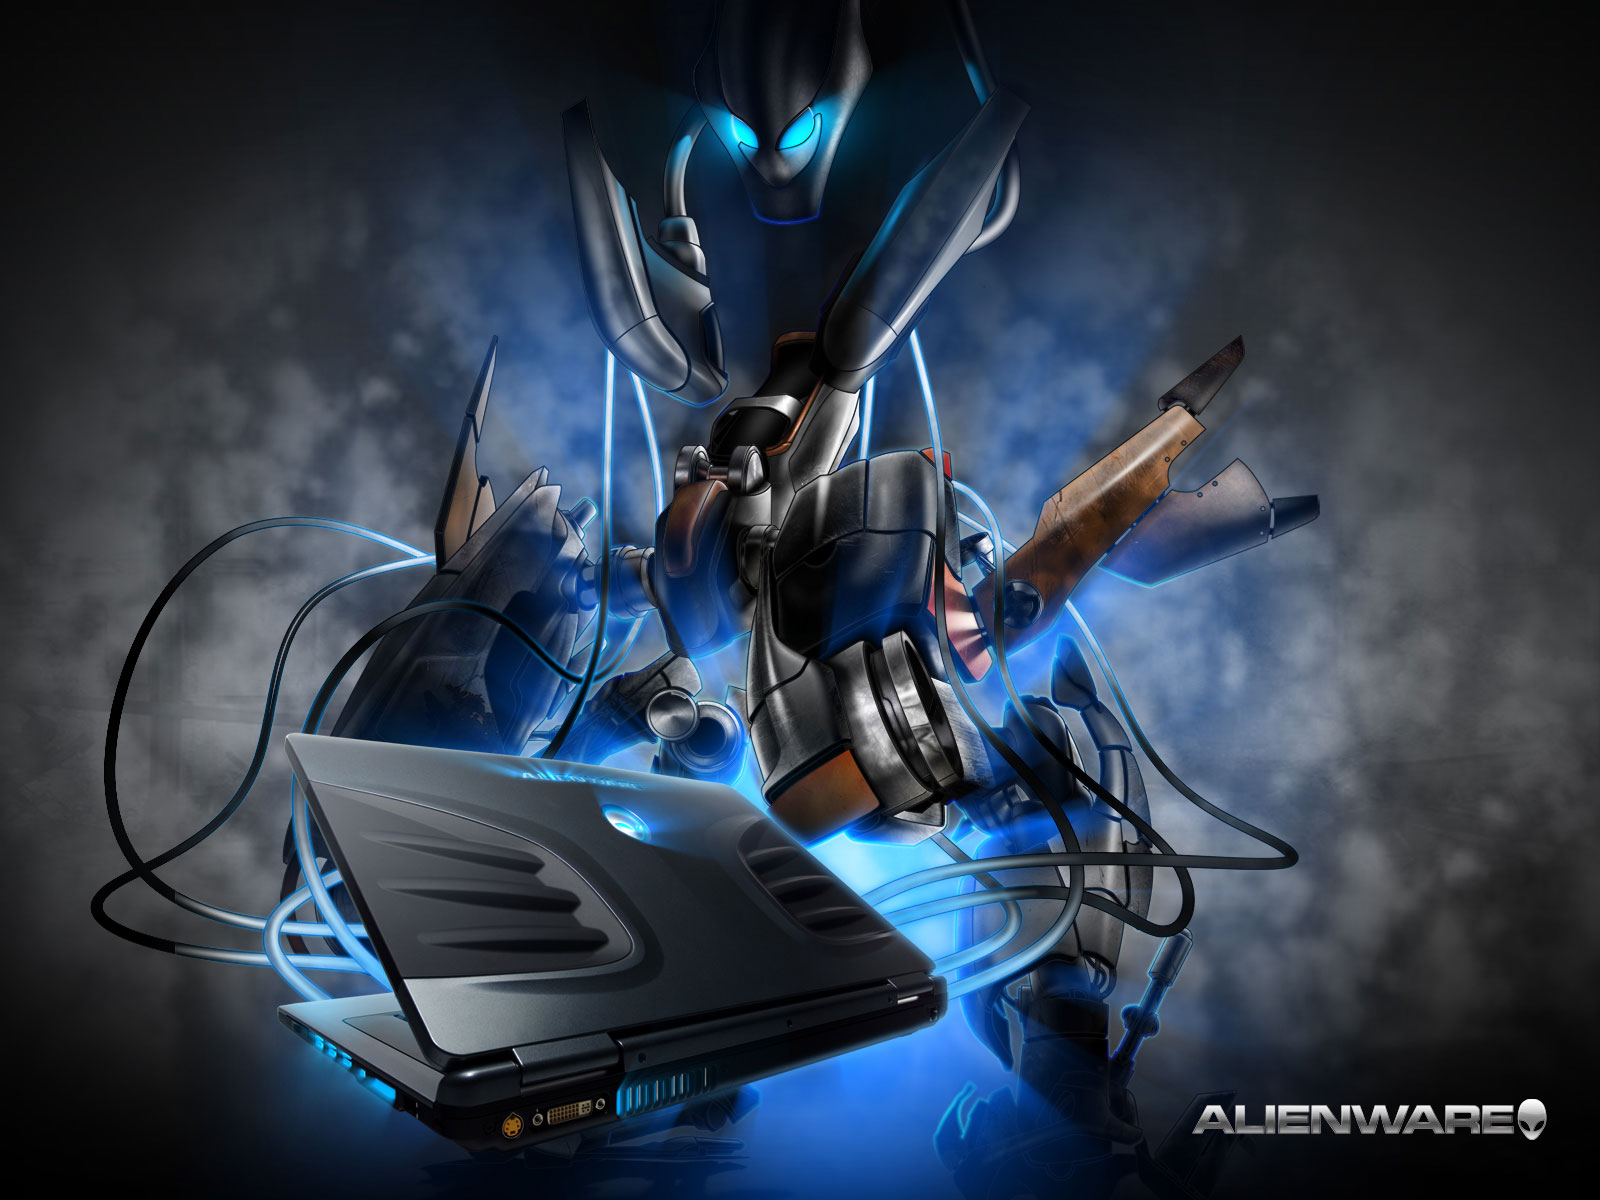 https://3.bp.blogspot.com/-8ID2cMp8opo/TmTCrOQJfgI/AAAAAAAAAf8/BwqZAljd2jw/s1600/Alienware-Wallpapers-.jpg